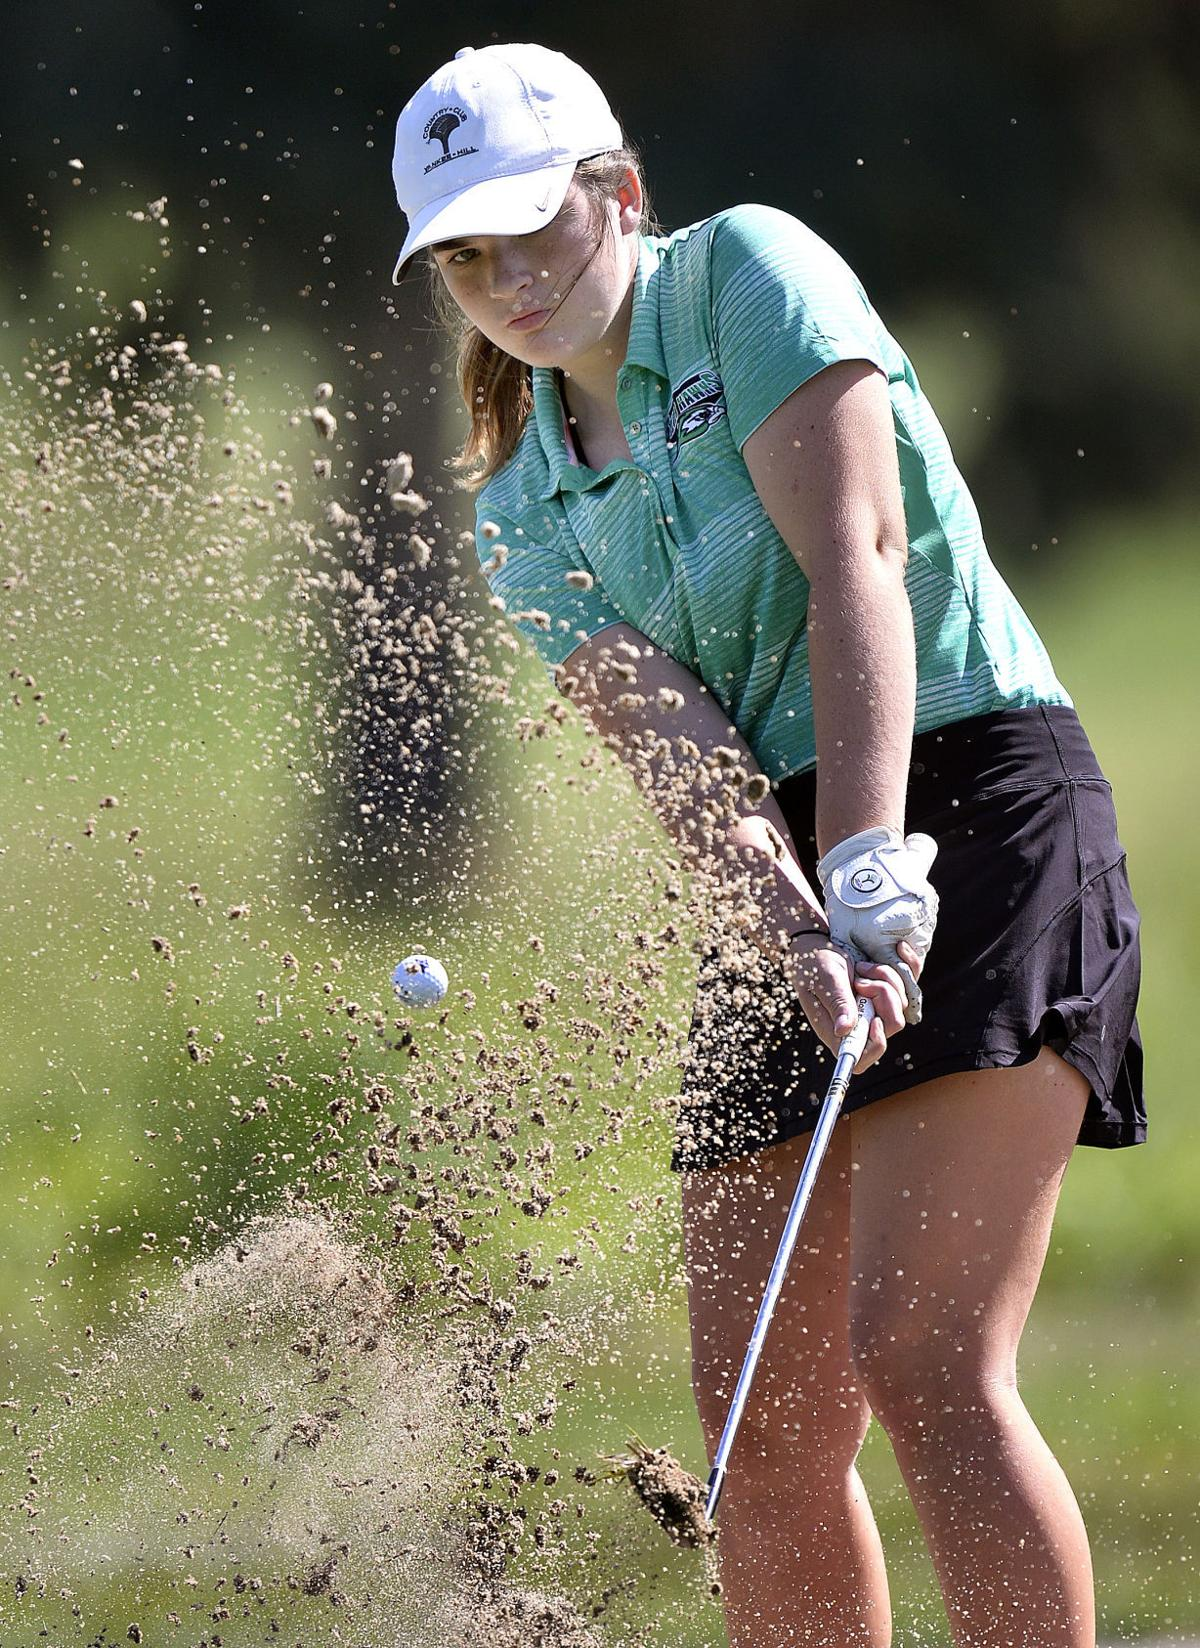 Lincoln Southeast Invitational, prep girls golf, 9/7/17